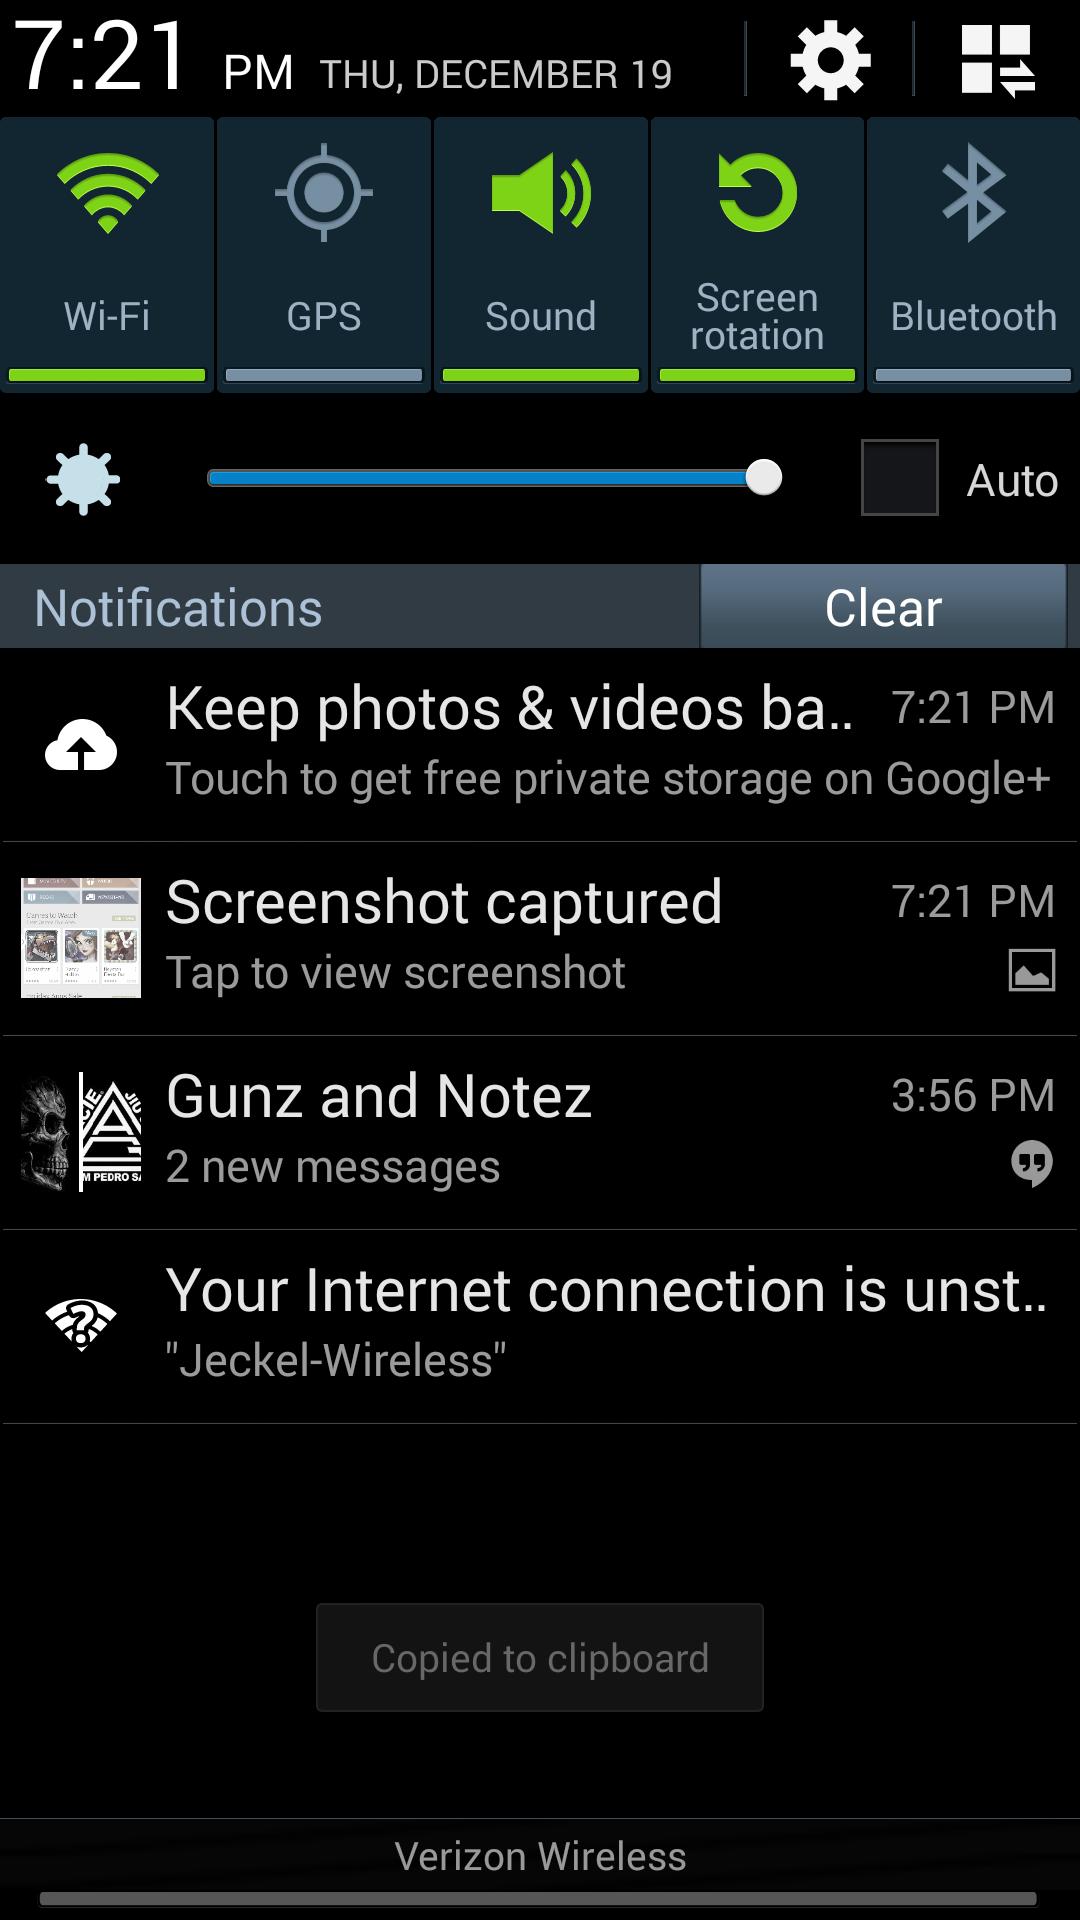 Screenshot_2013-12-19-19-21-55.png